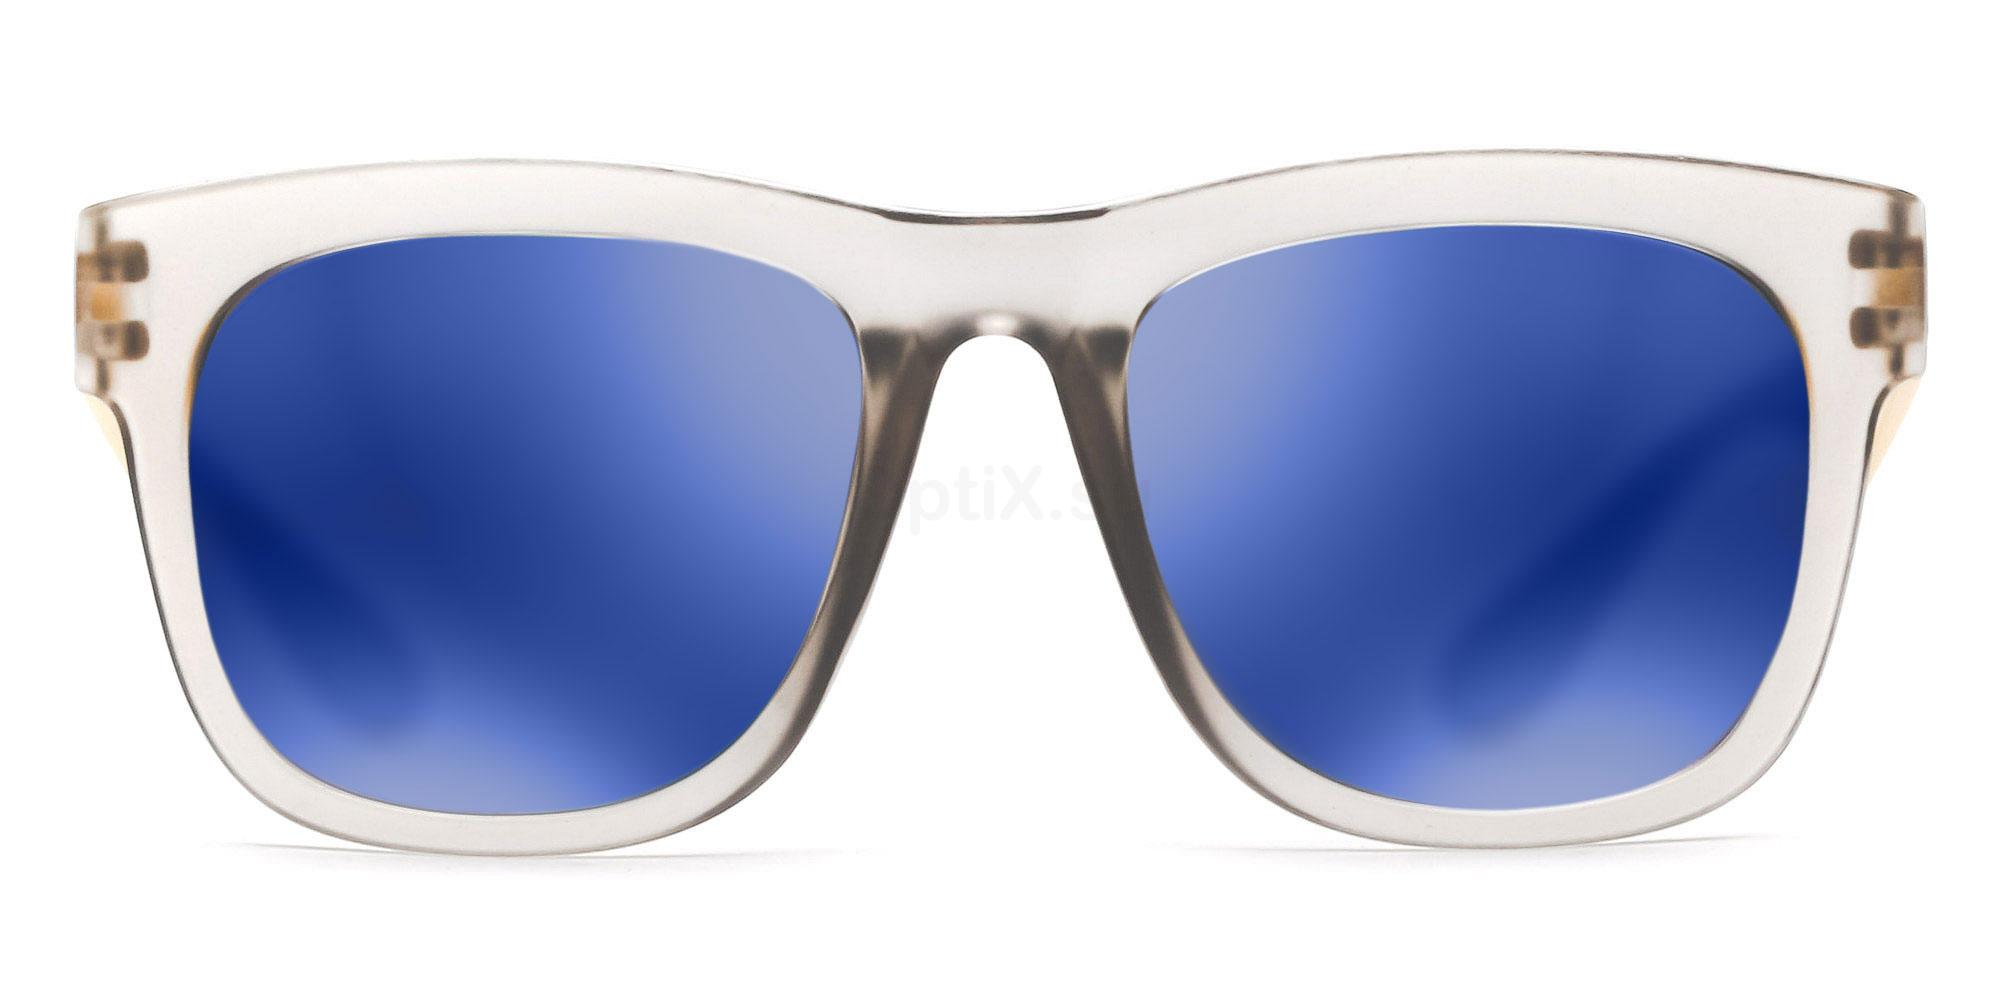 C17 S9199 Sunglasses, Savannah